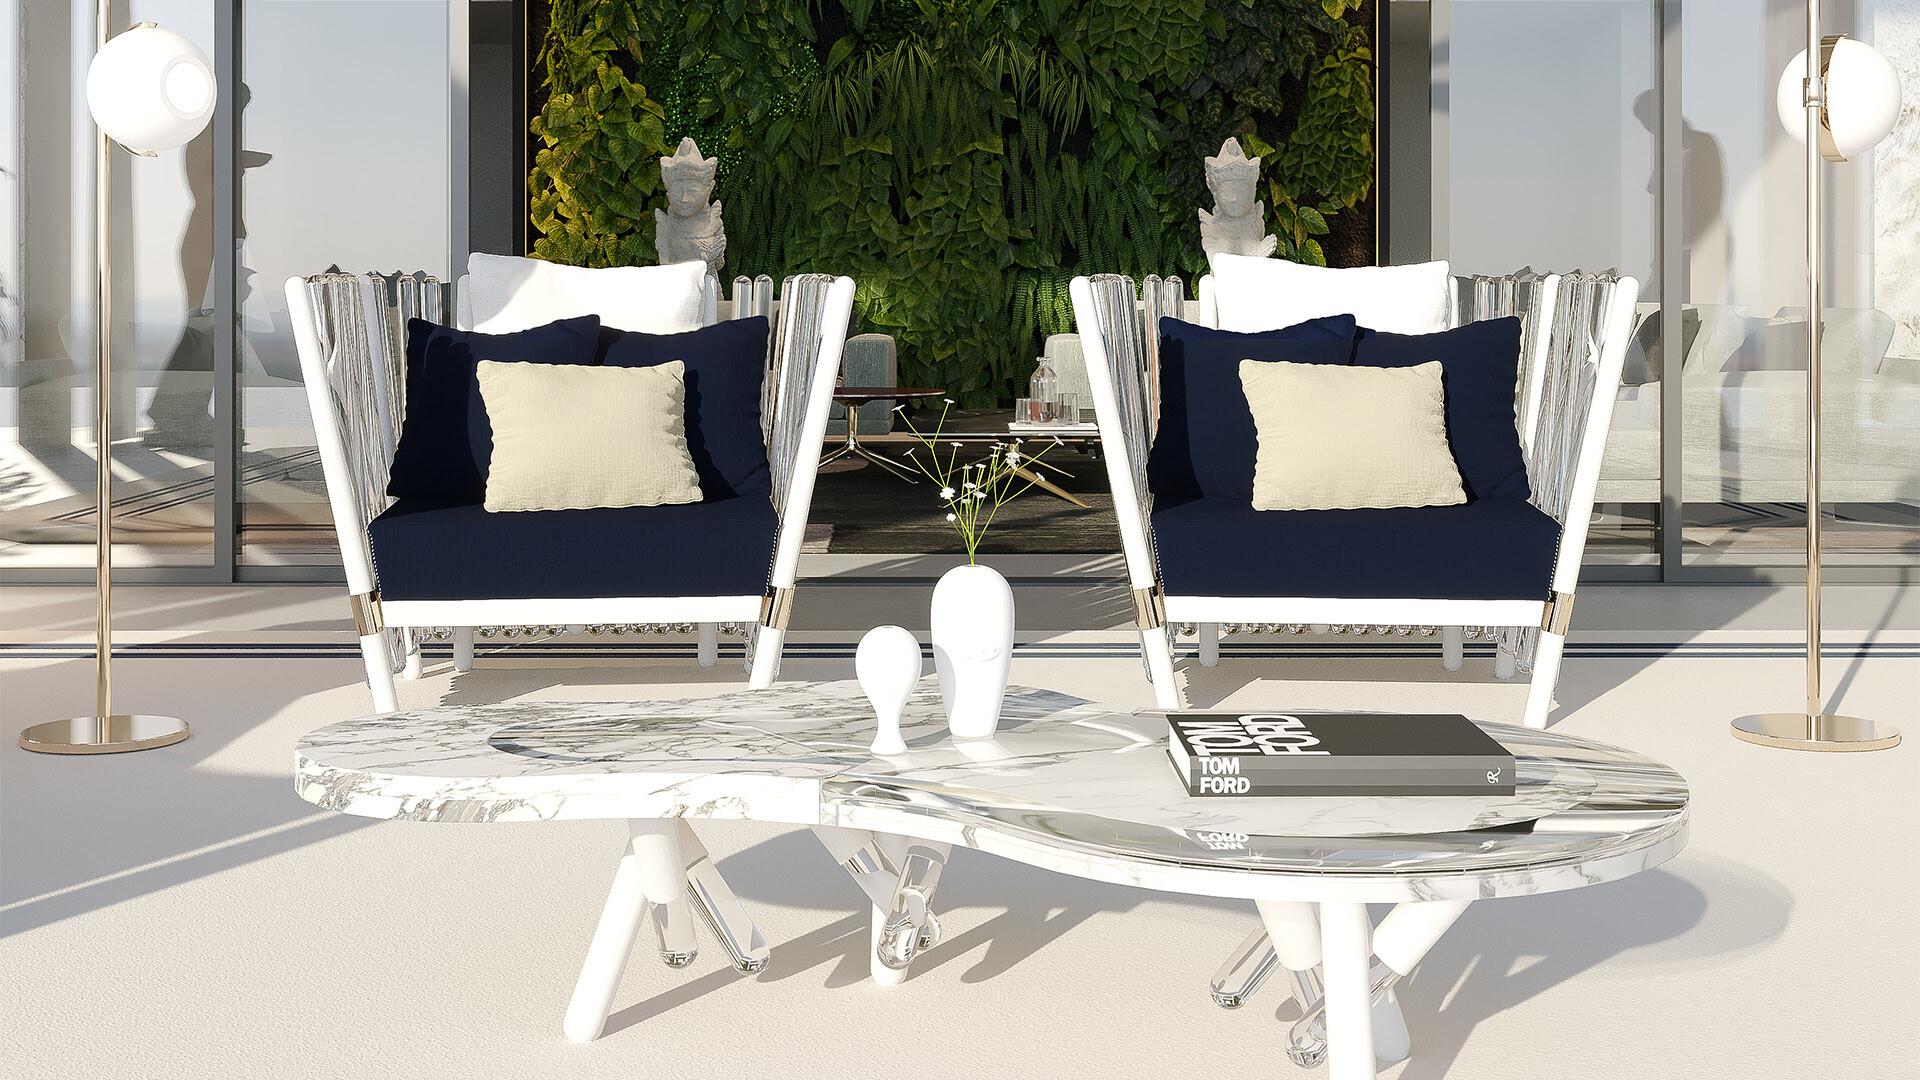 myface-miami-luxury-residence (1)